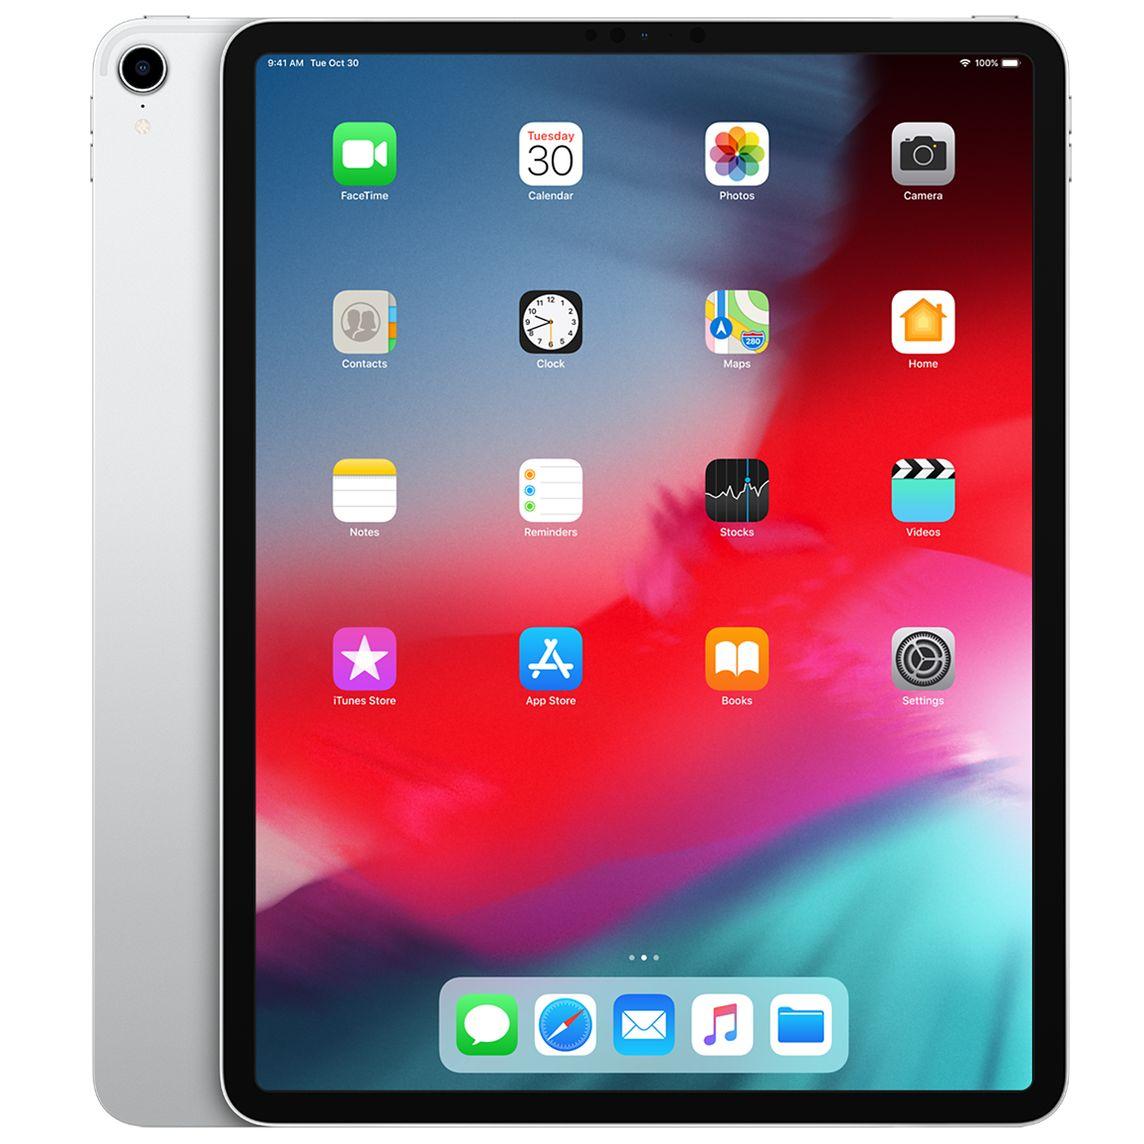 Refurbished 12.9-inch iPad Pro Wi-Fi 64GB - Silver / Space Gray (3rd Generation) $629